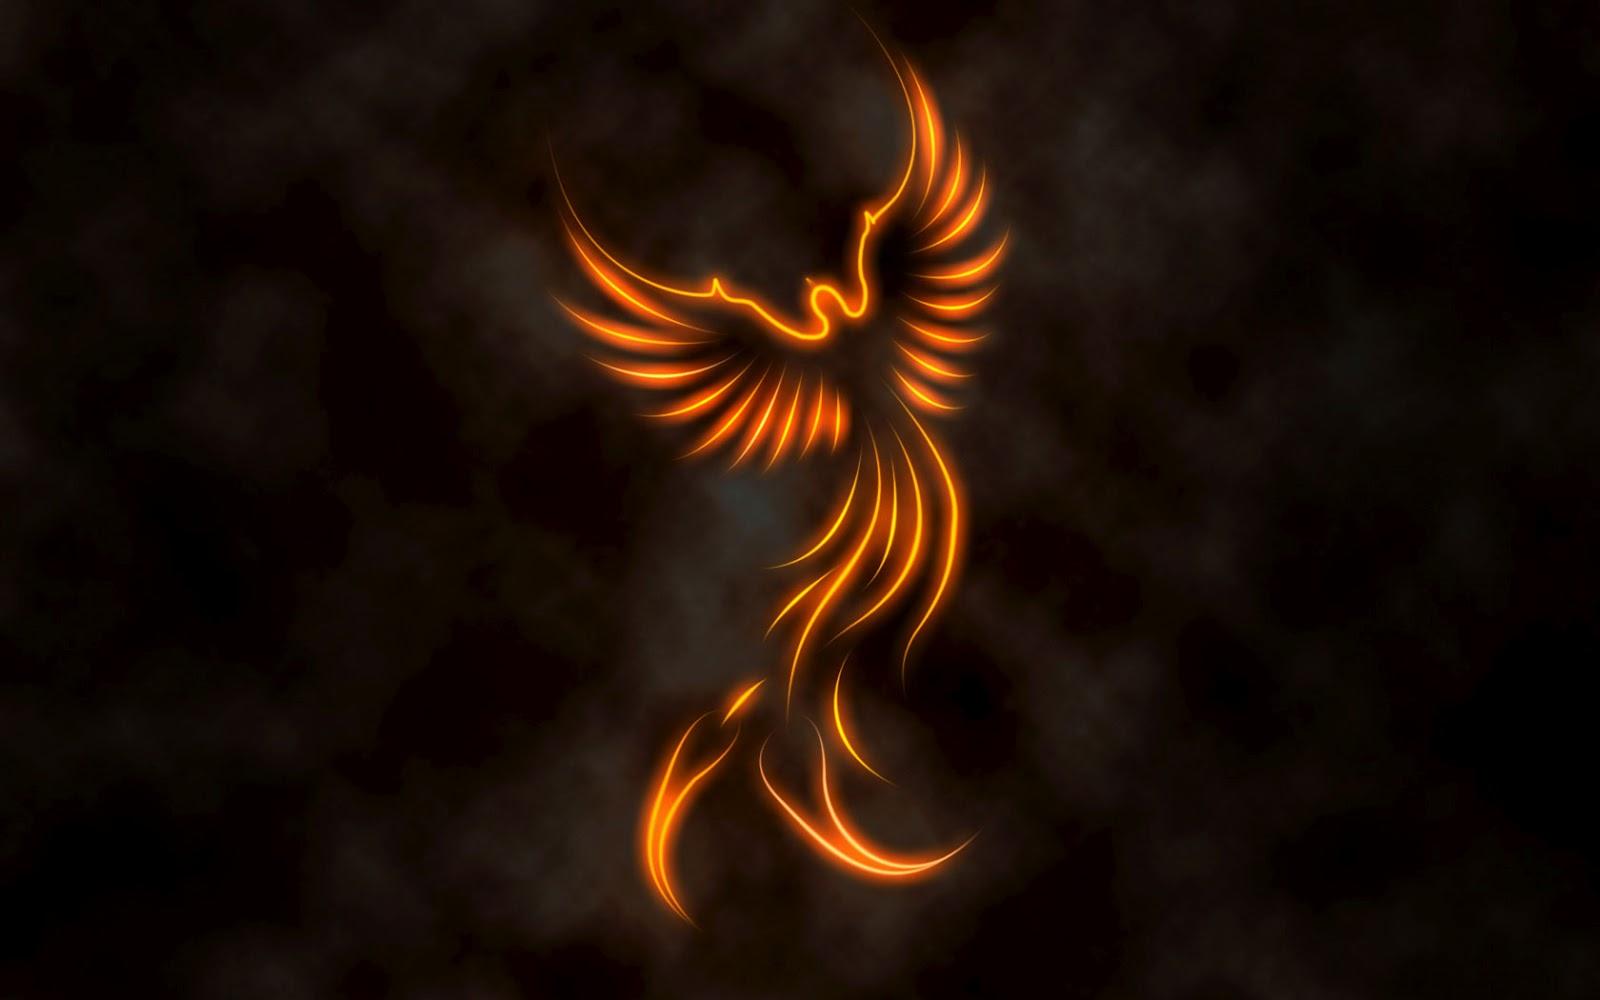 Dota2 : Phoenix desktop wallpaper